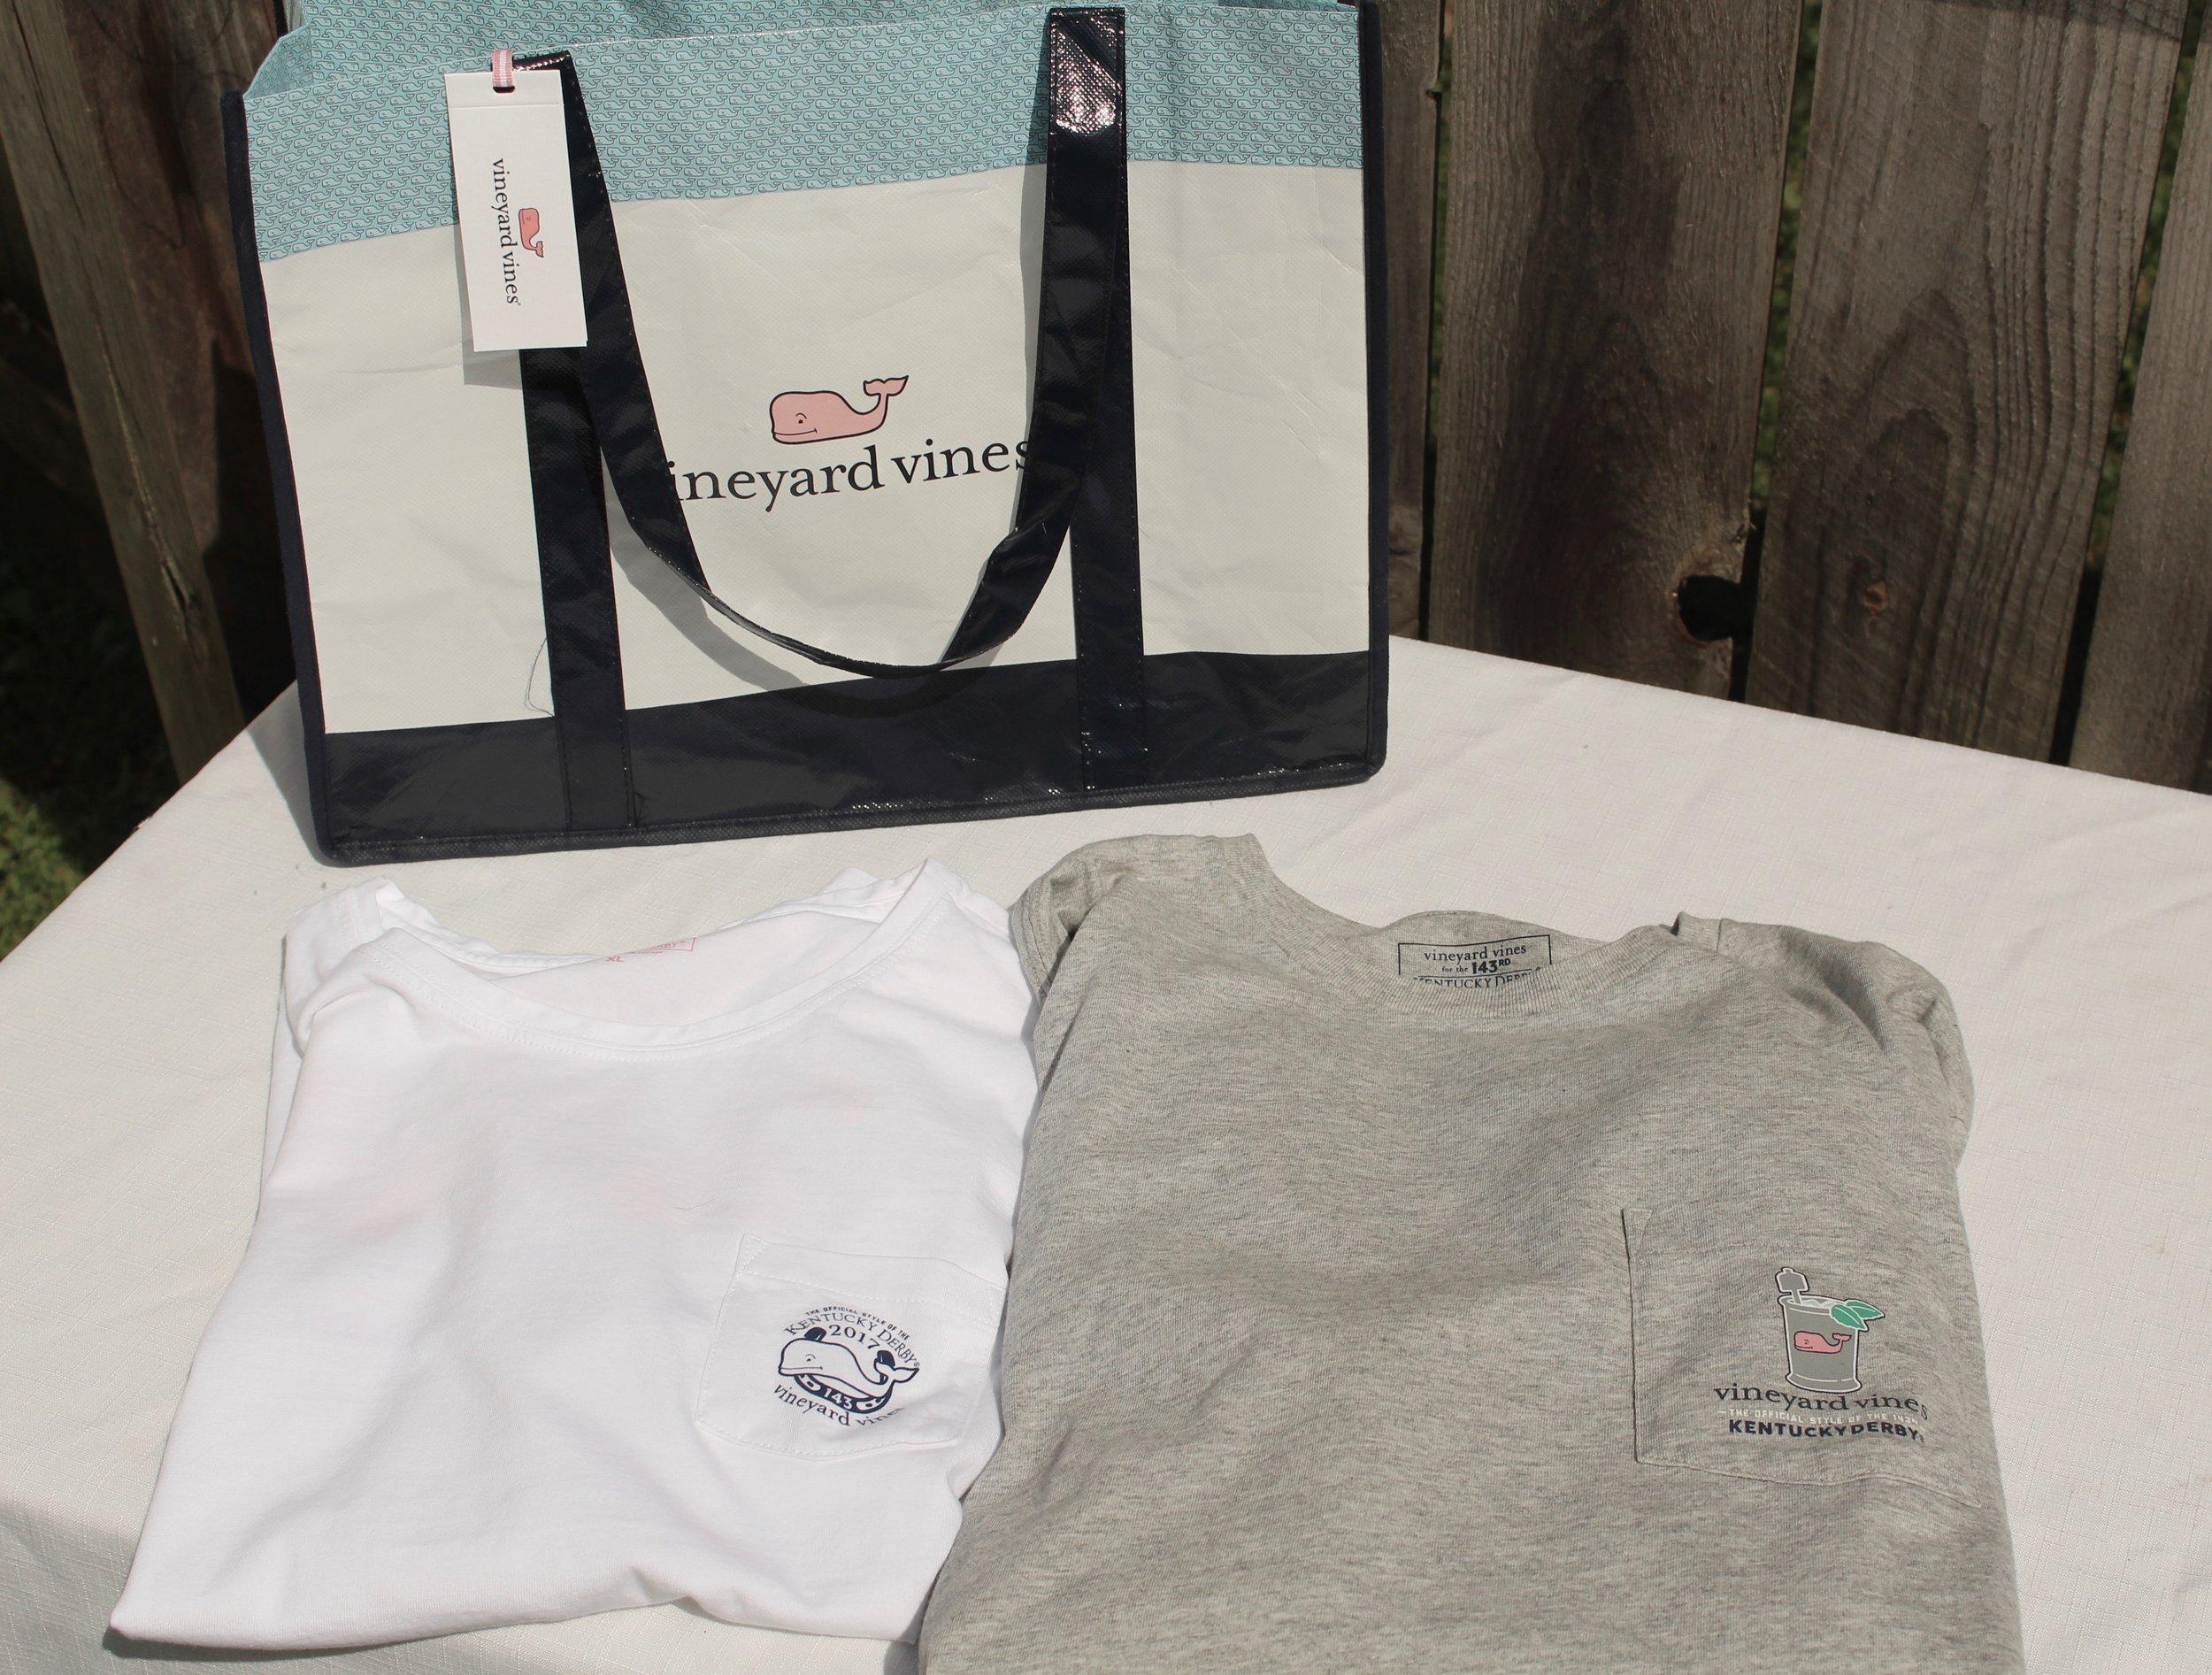 Vineyard Vines Kentucky Derby Shirts